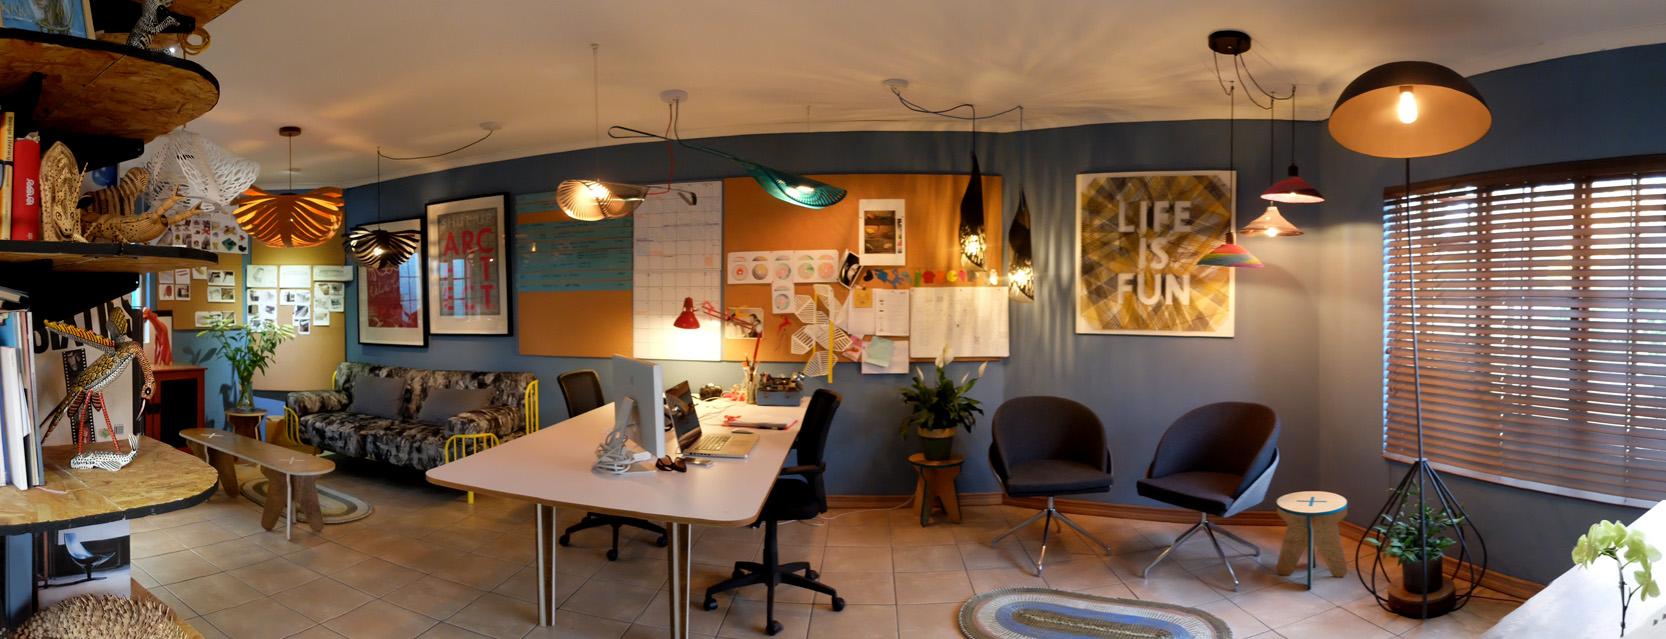 the MOS studio.jpg